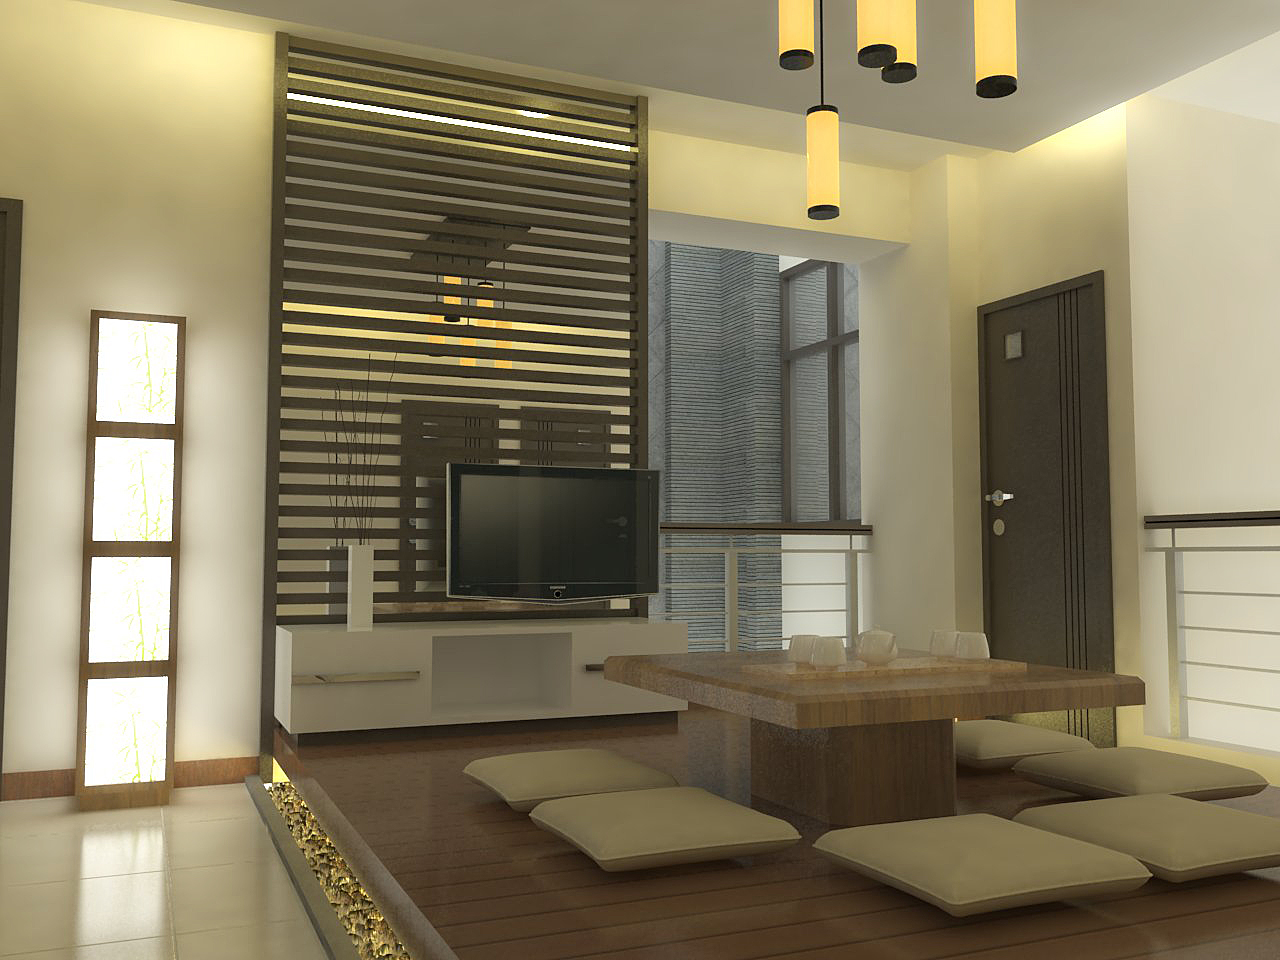 Gambar design interior apartemen 2 kamar bedroom design for Design apartemen 2 kamar